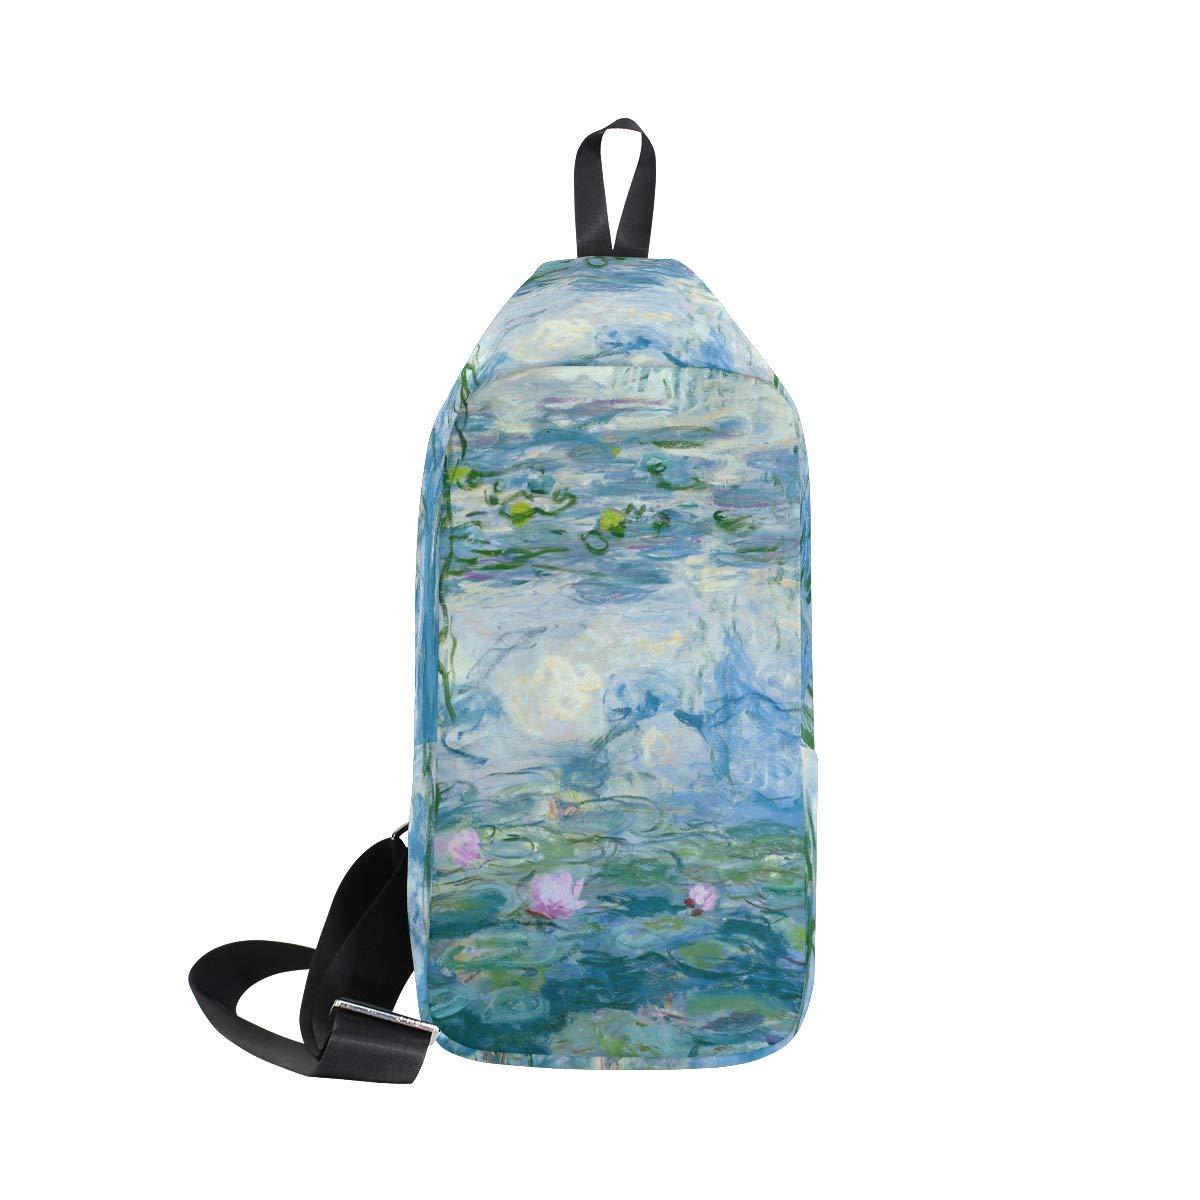 AHOMY Water Lilies By Claude Monet Oil Paintings Flowers Messenger Bag Small Travel School Sling Bag Crossbody Bag